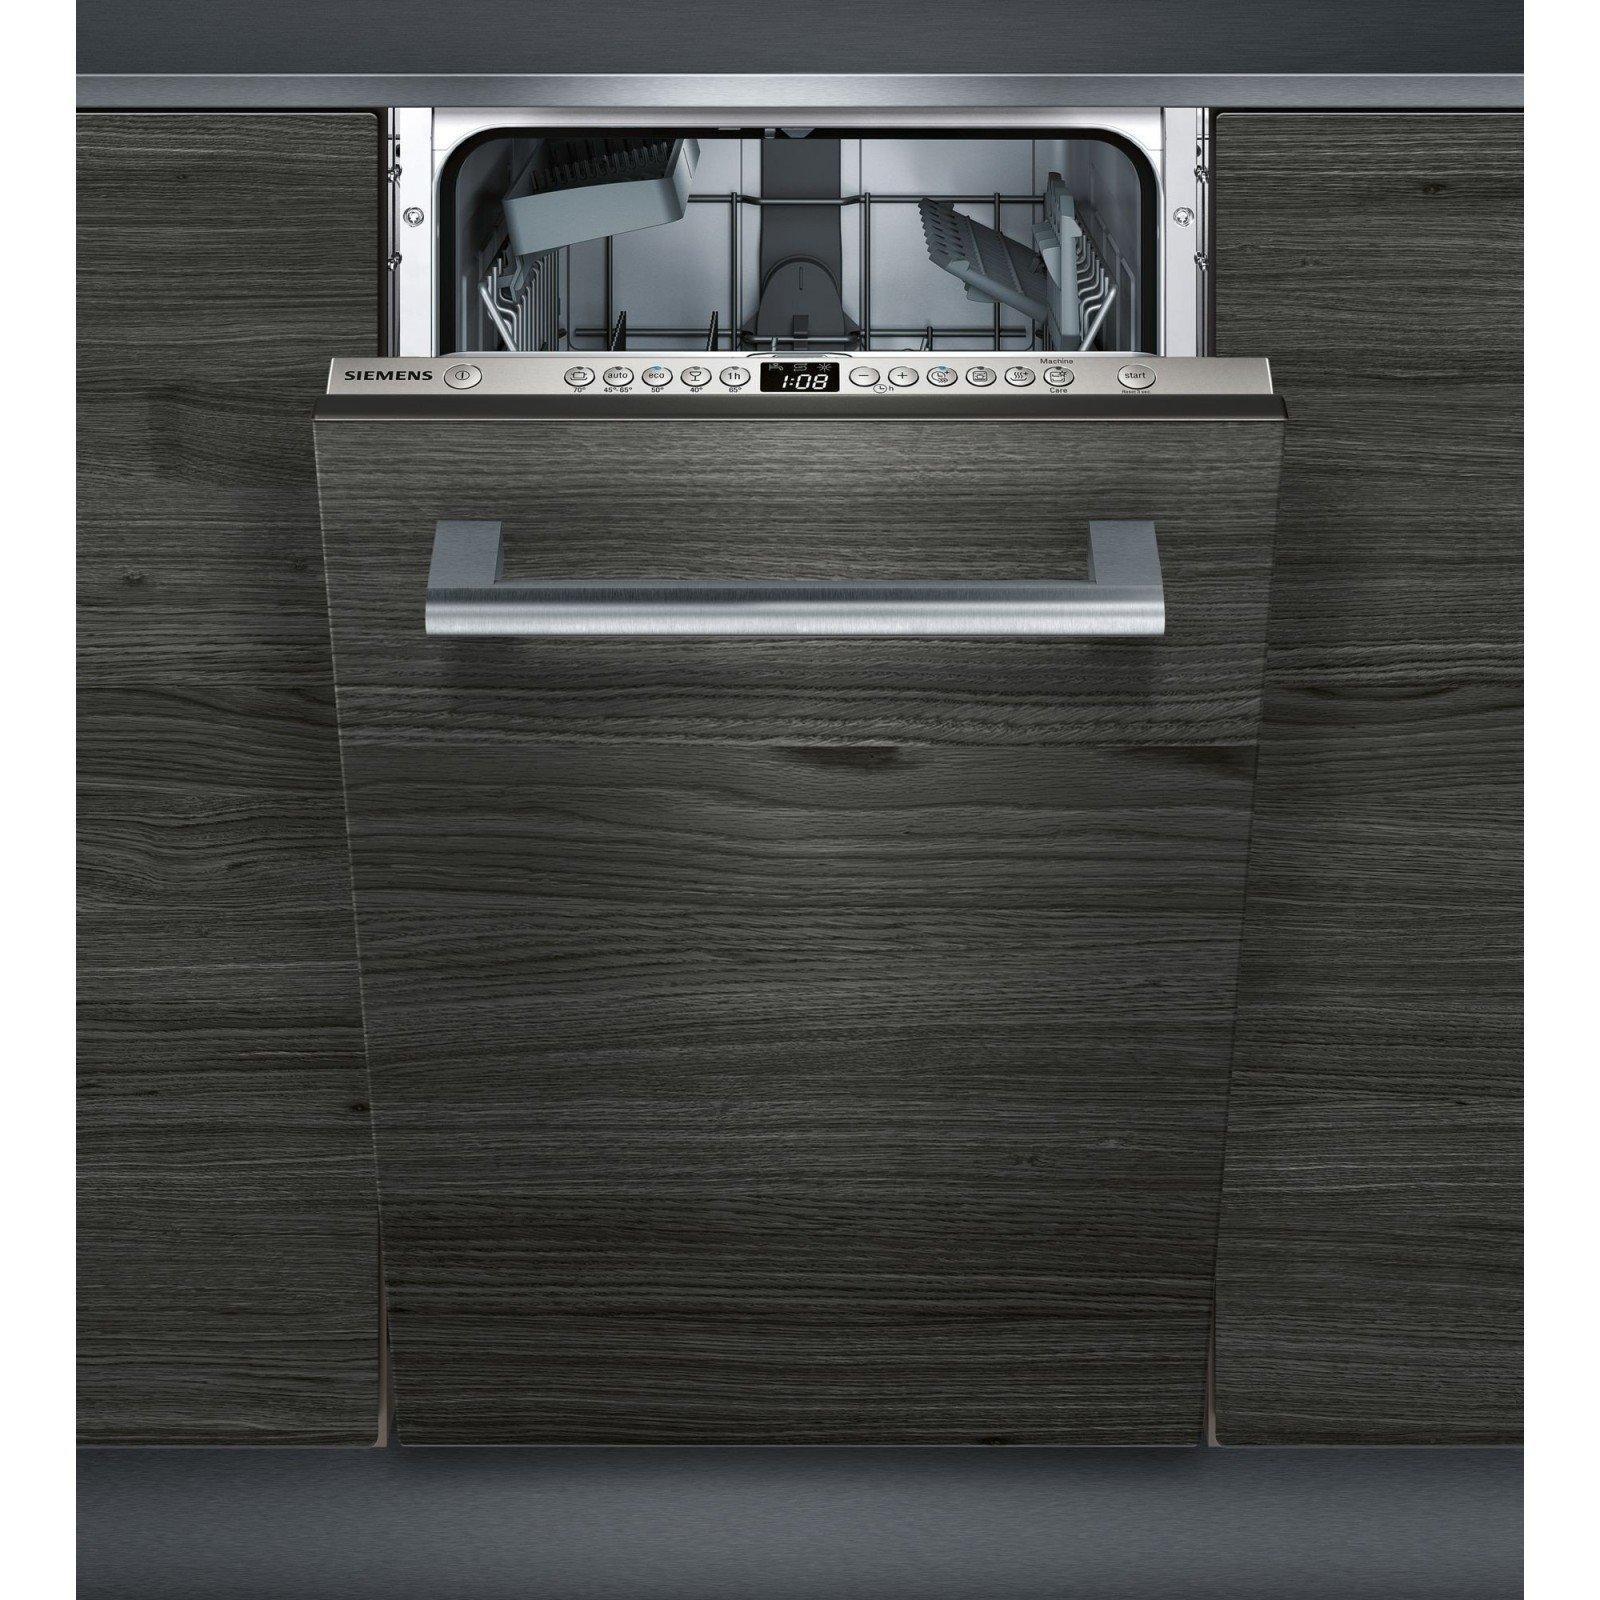 Посудомоечная машина Siemens SR 635 X01IE